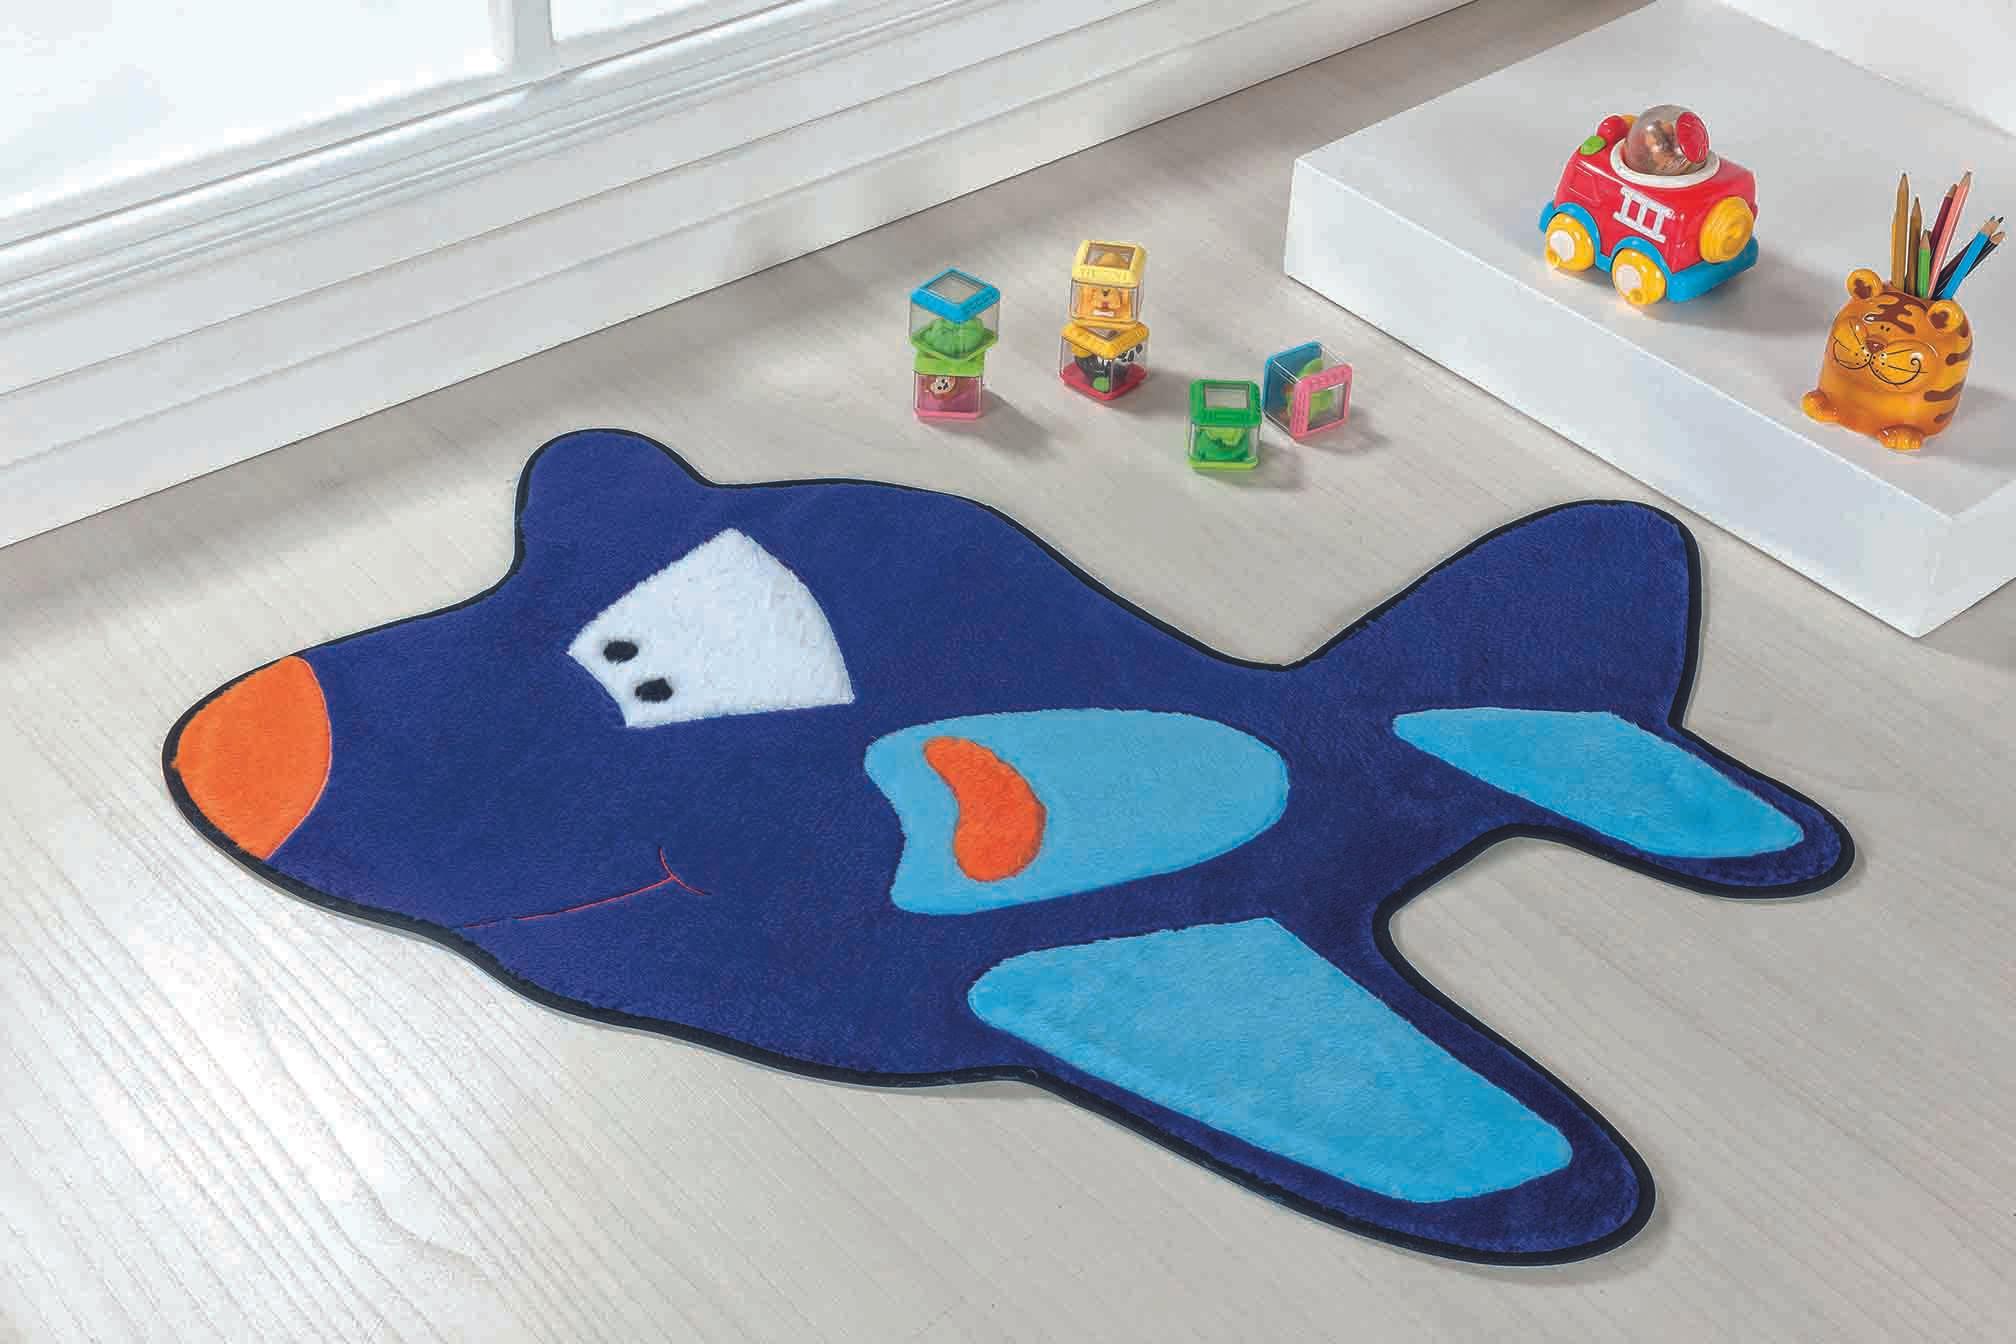 Tapete Premium Baby Avião 98cm x 68cm Azul Royal Guga Tapetes